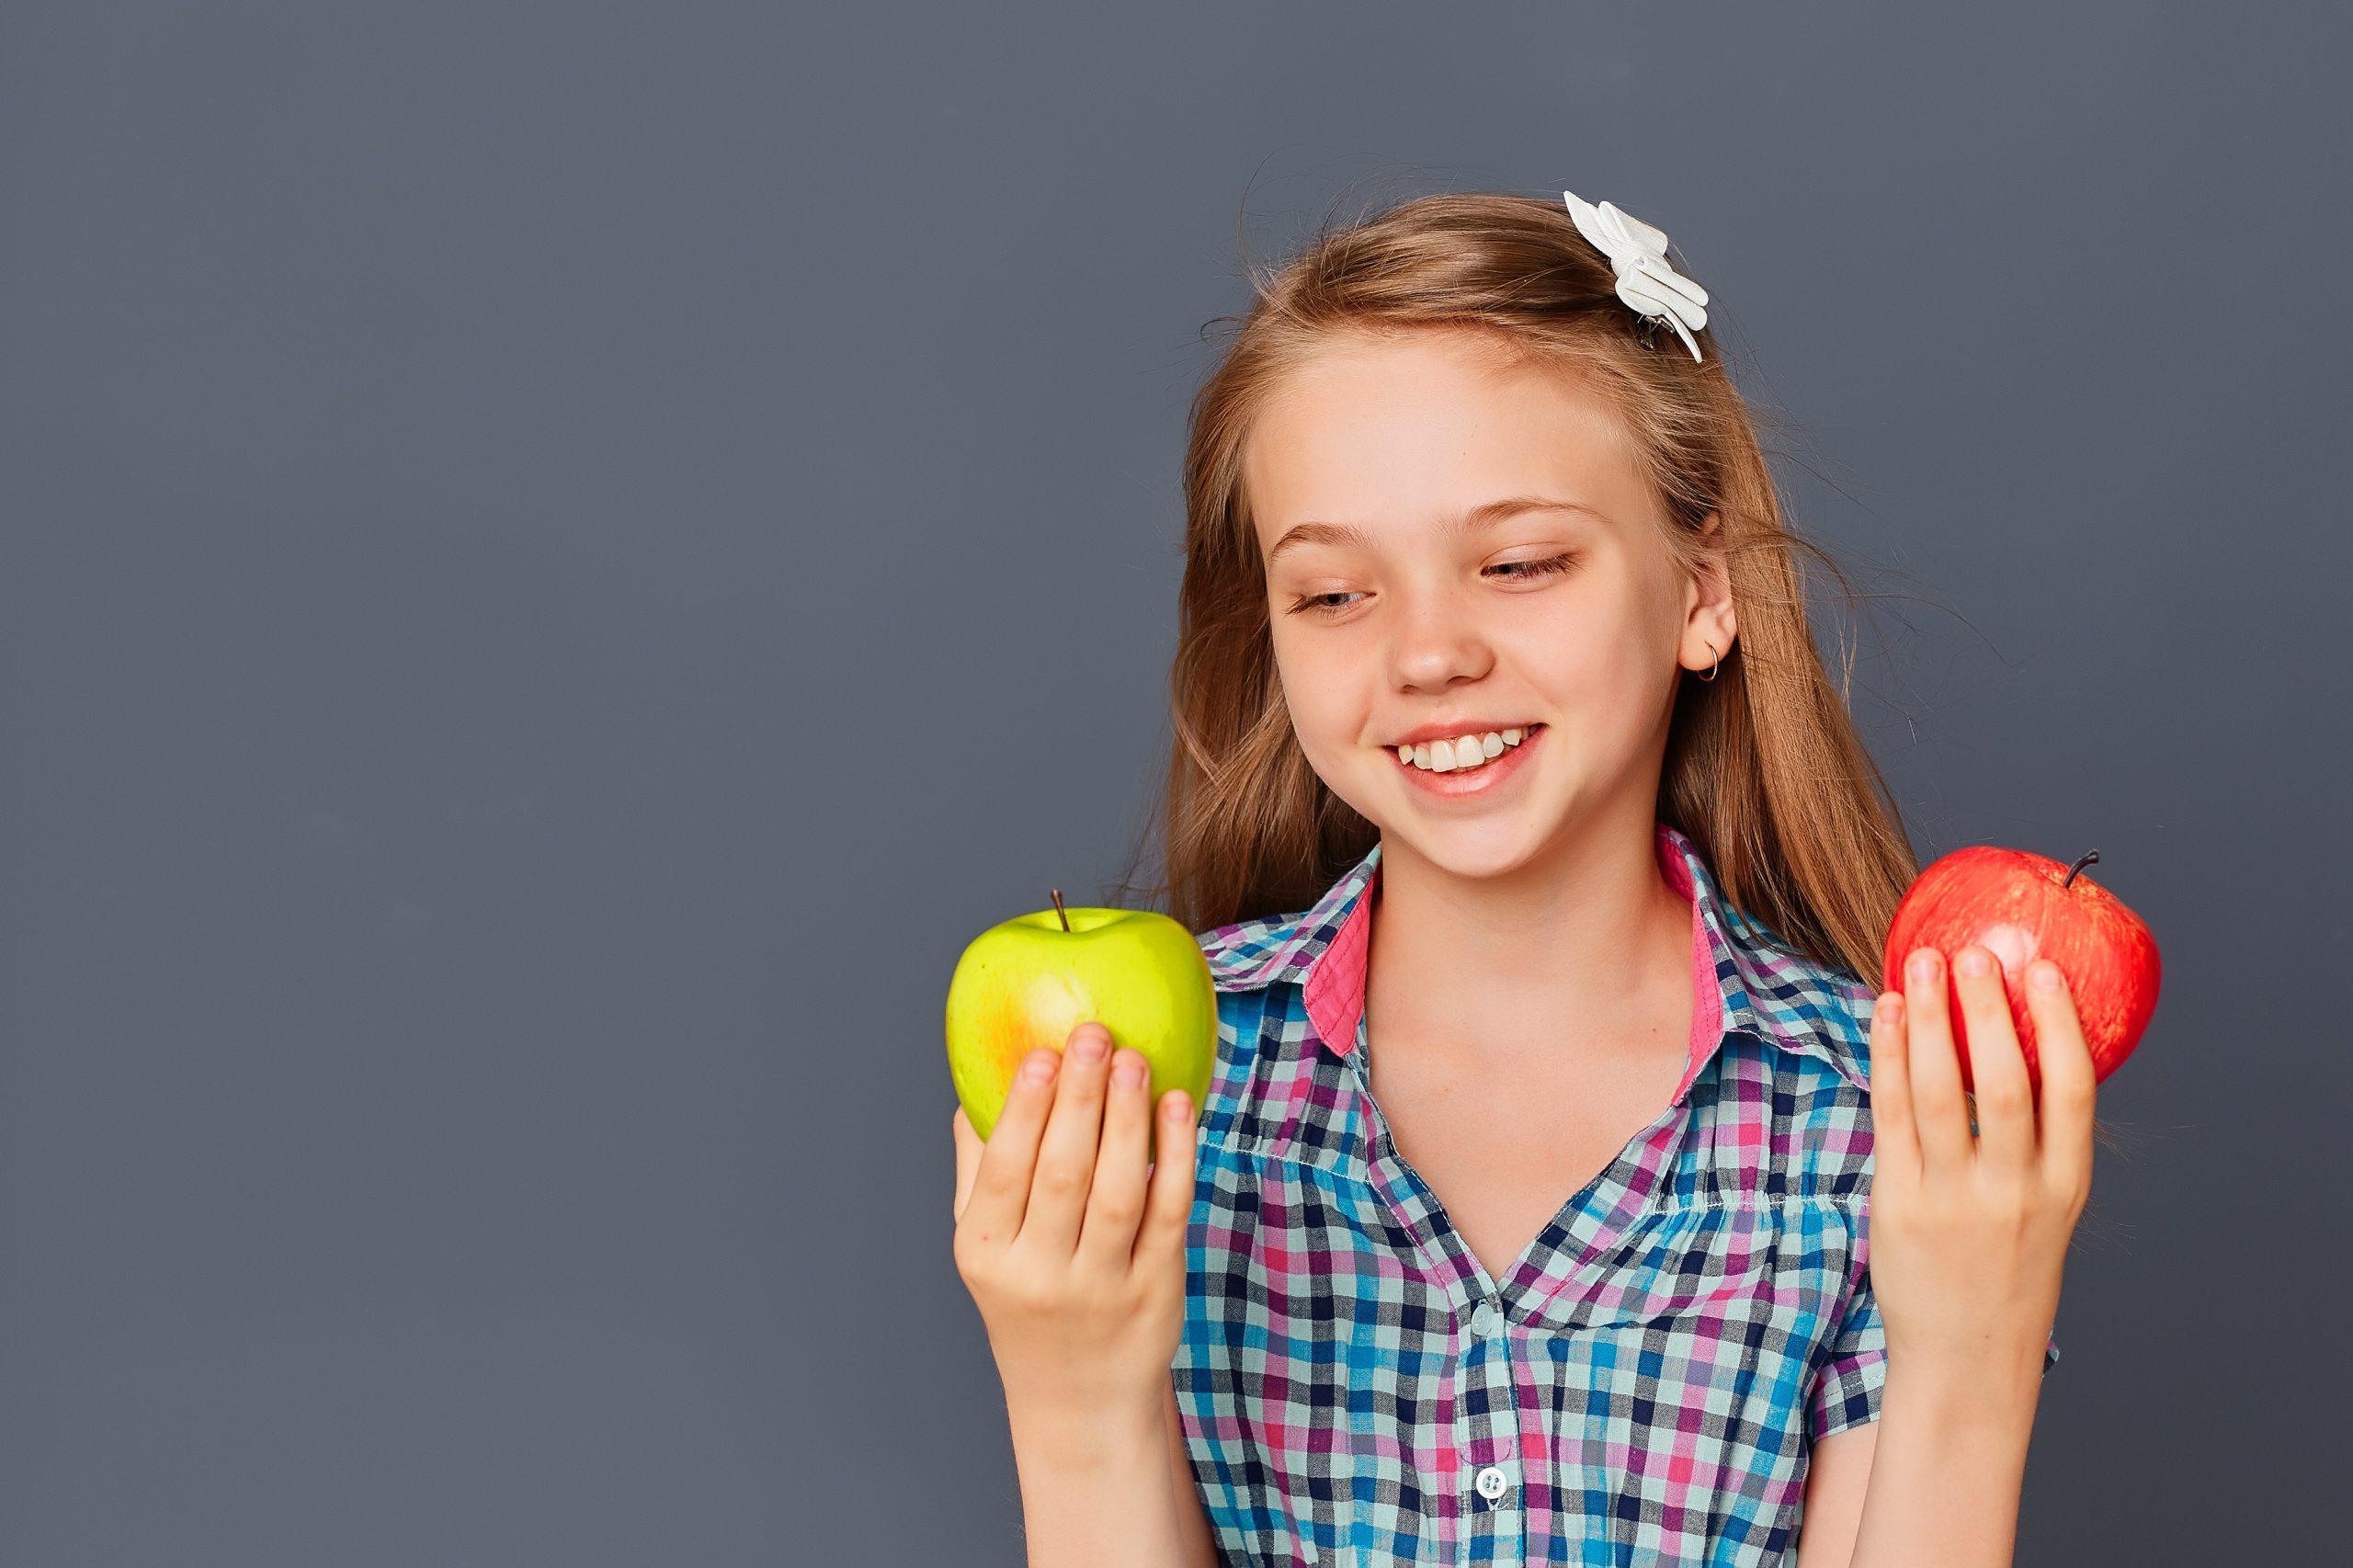 Upsoftskills - Decision making course for kids